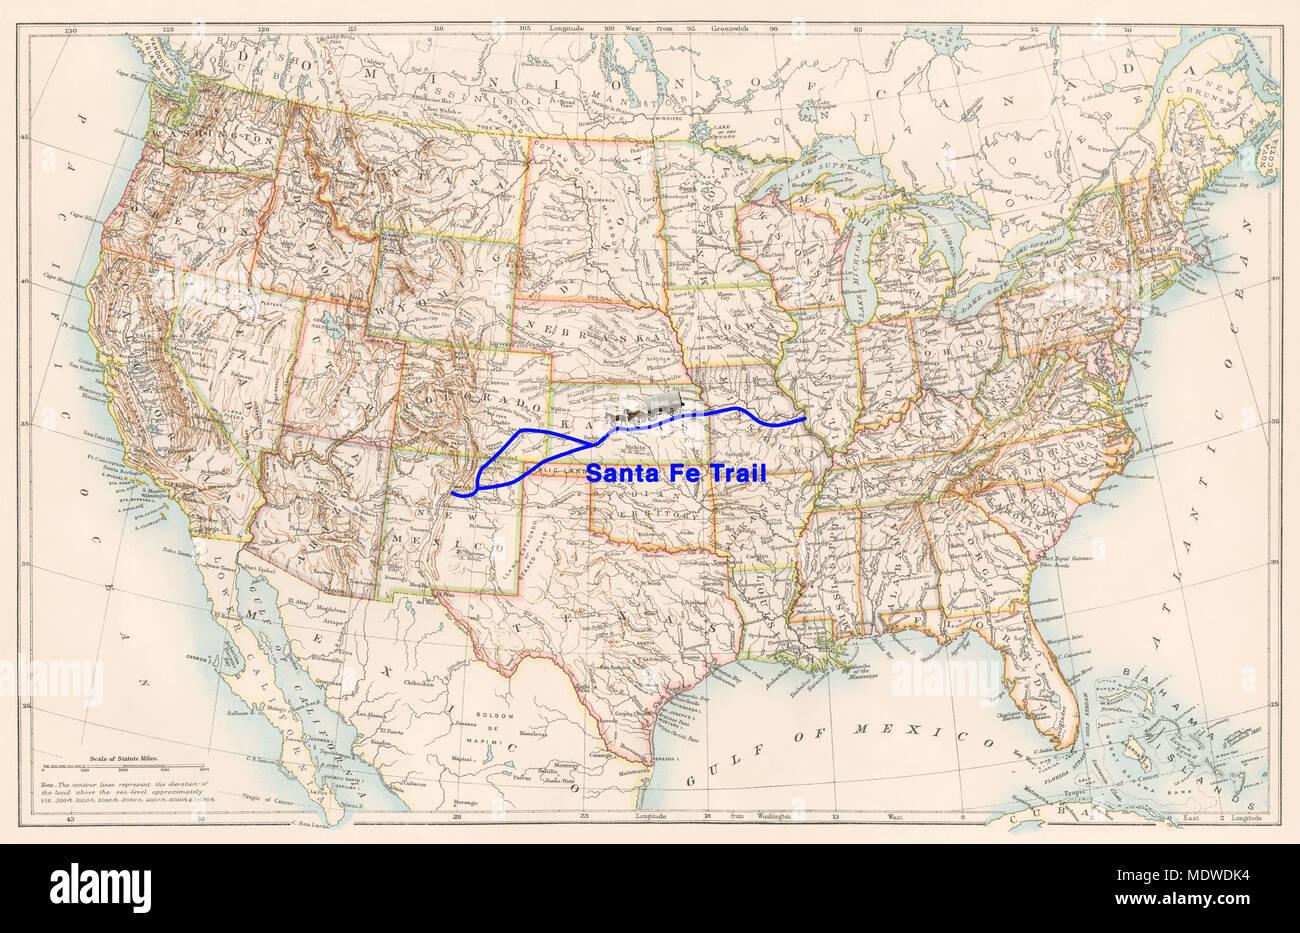 Santa Fe Trail Map Stockfotos & Santa Fe Trail Map Bilder - Alamy